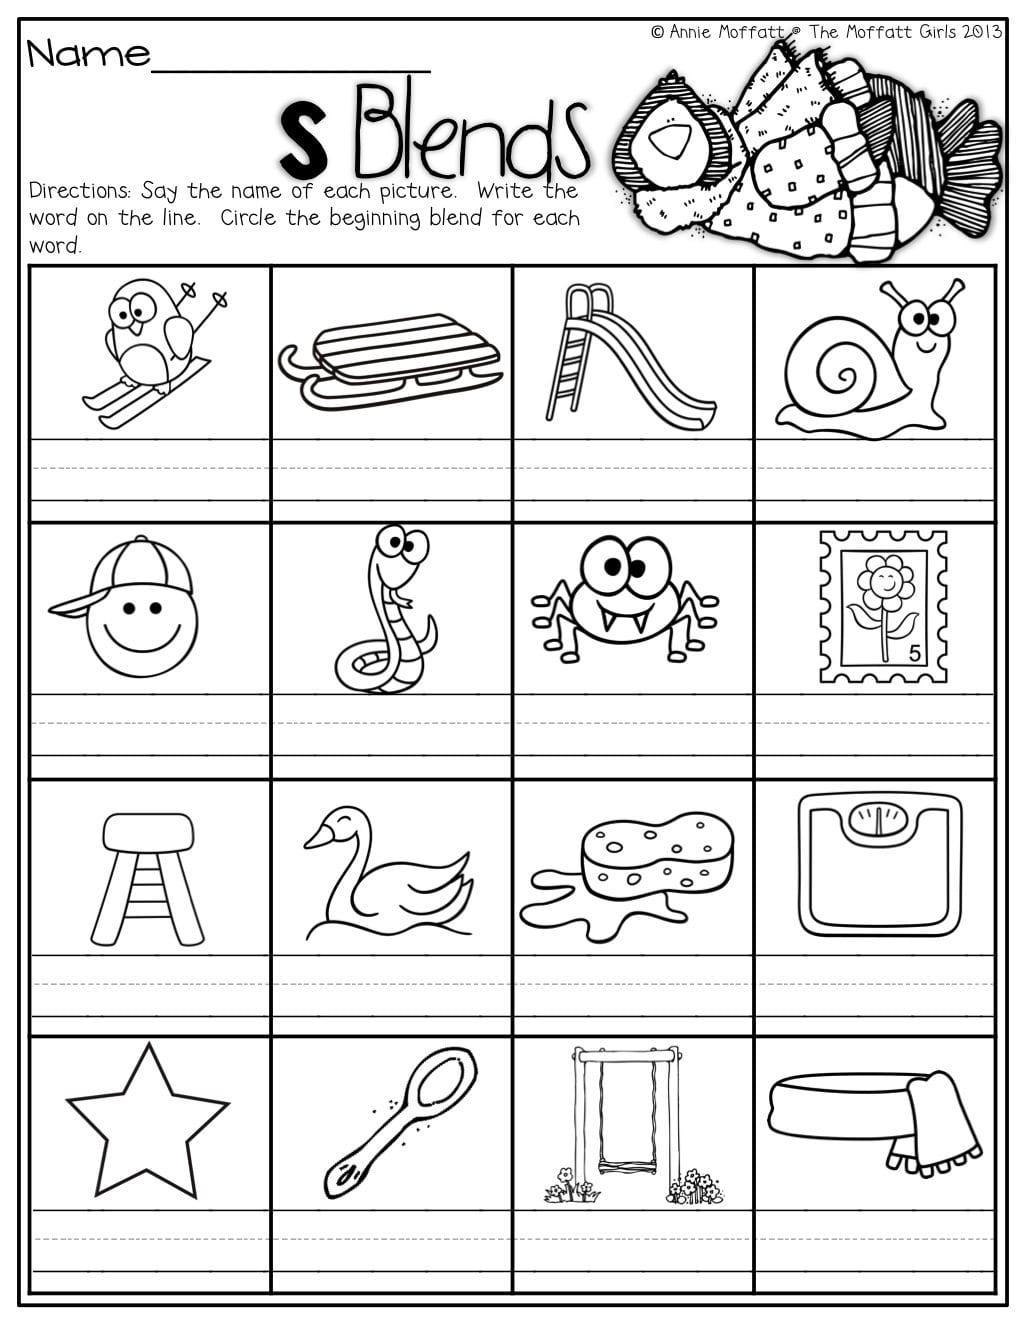 Worksheet Ideas Consonant Digraphs Worksheets 1strade S